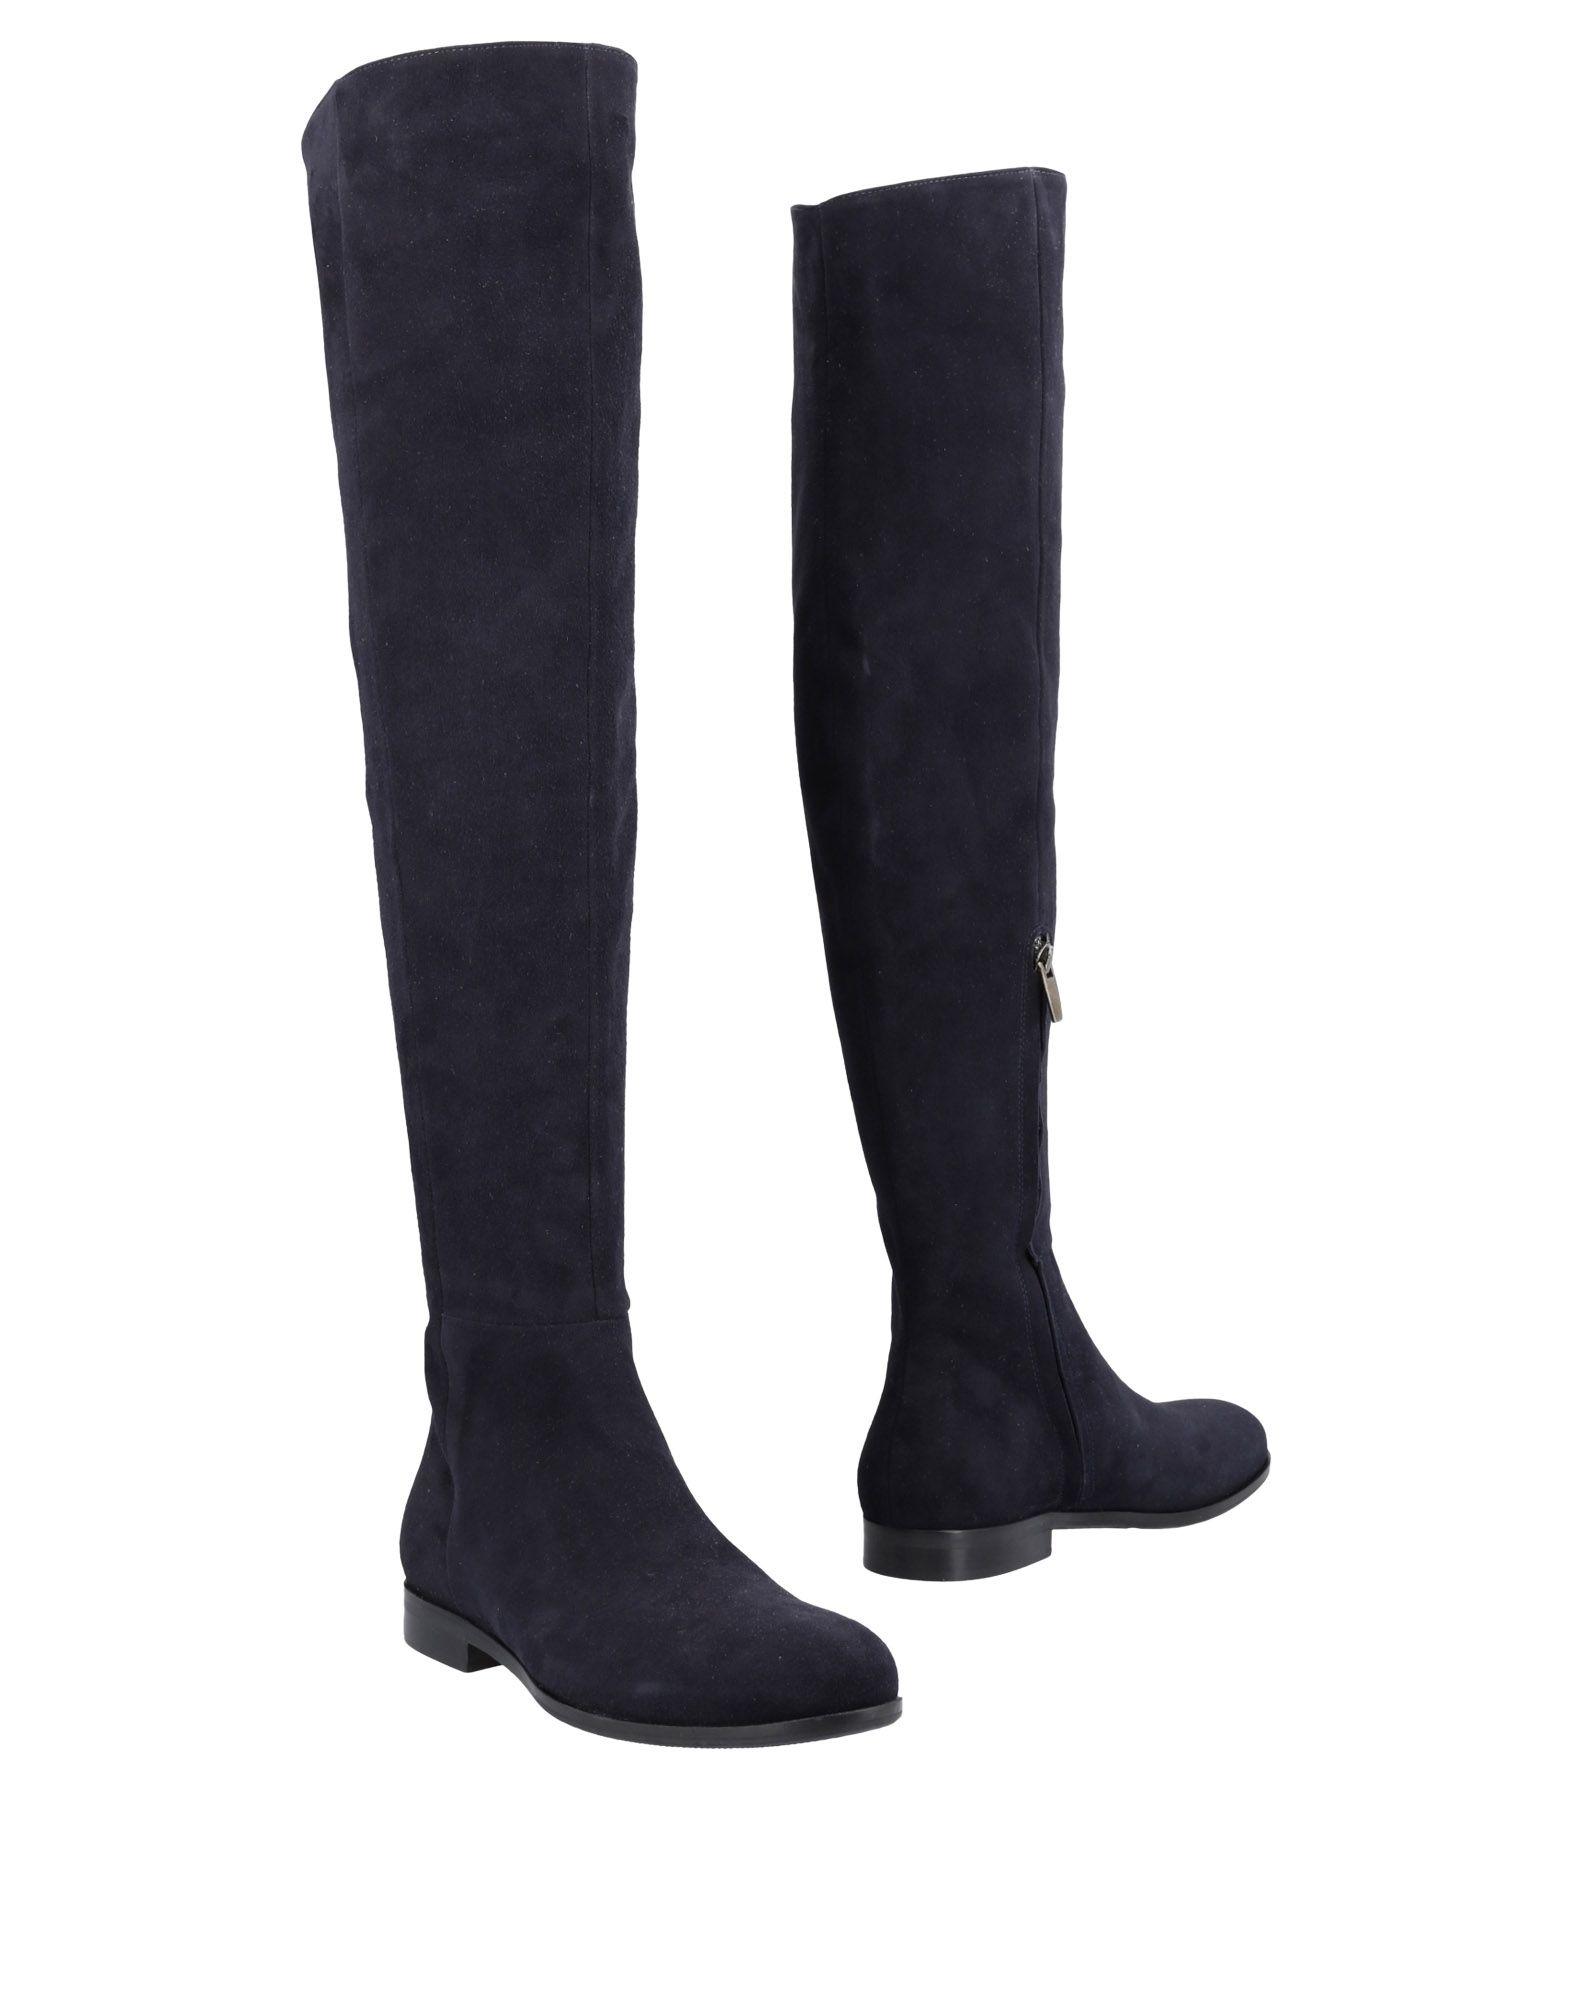 Pavin Boots - Women Pavin Australia Boots online on  Australia Pavin - 11483393MK 865b5b